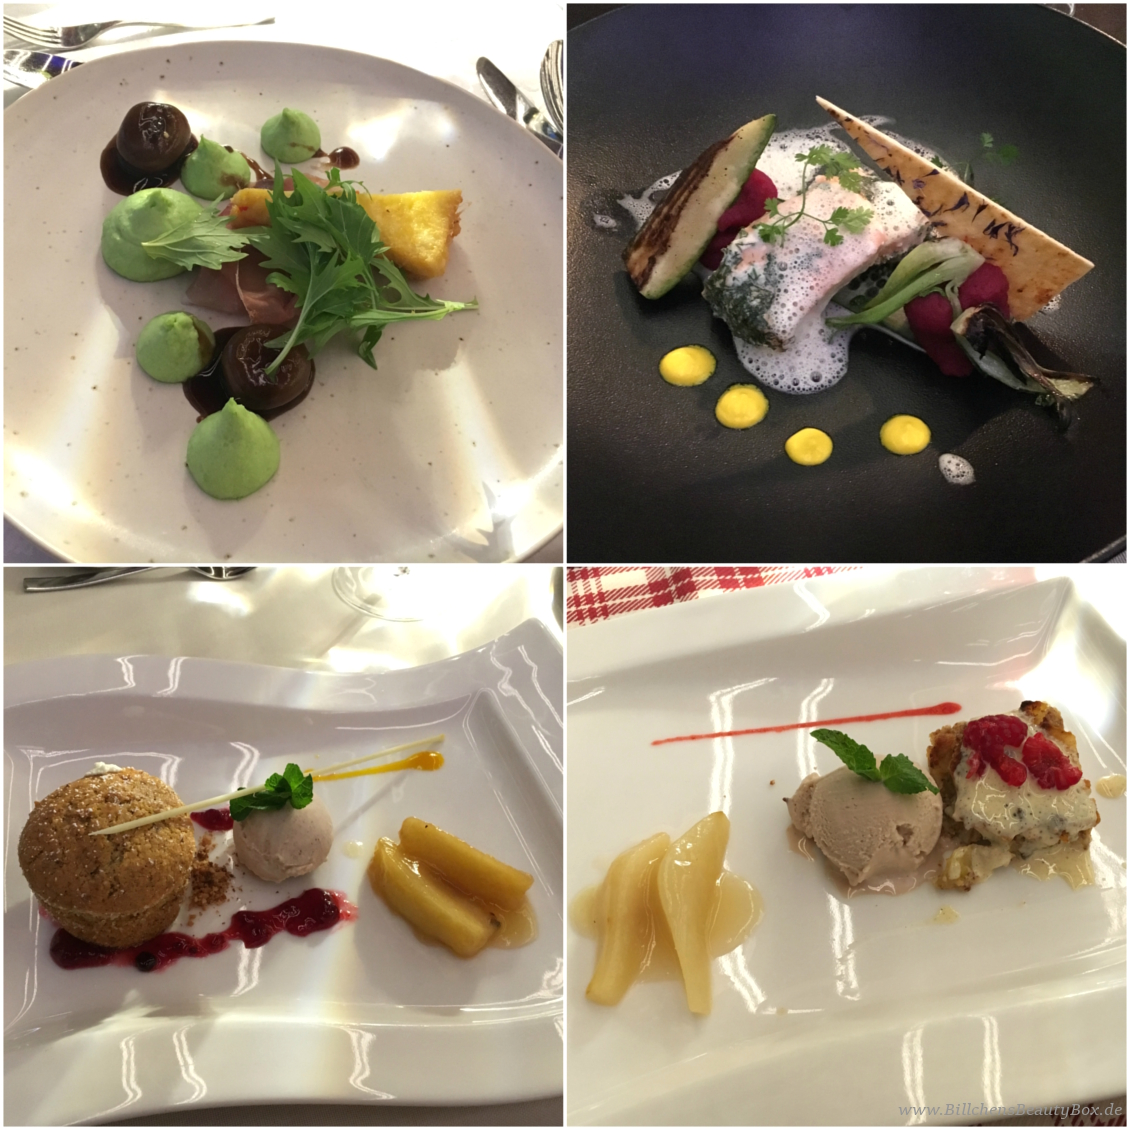 Wellnesshotel Alpenschlössl - Ahrntal Südtirol - Abendessen - 5-Gänge